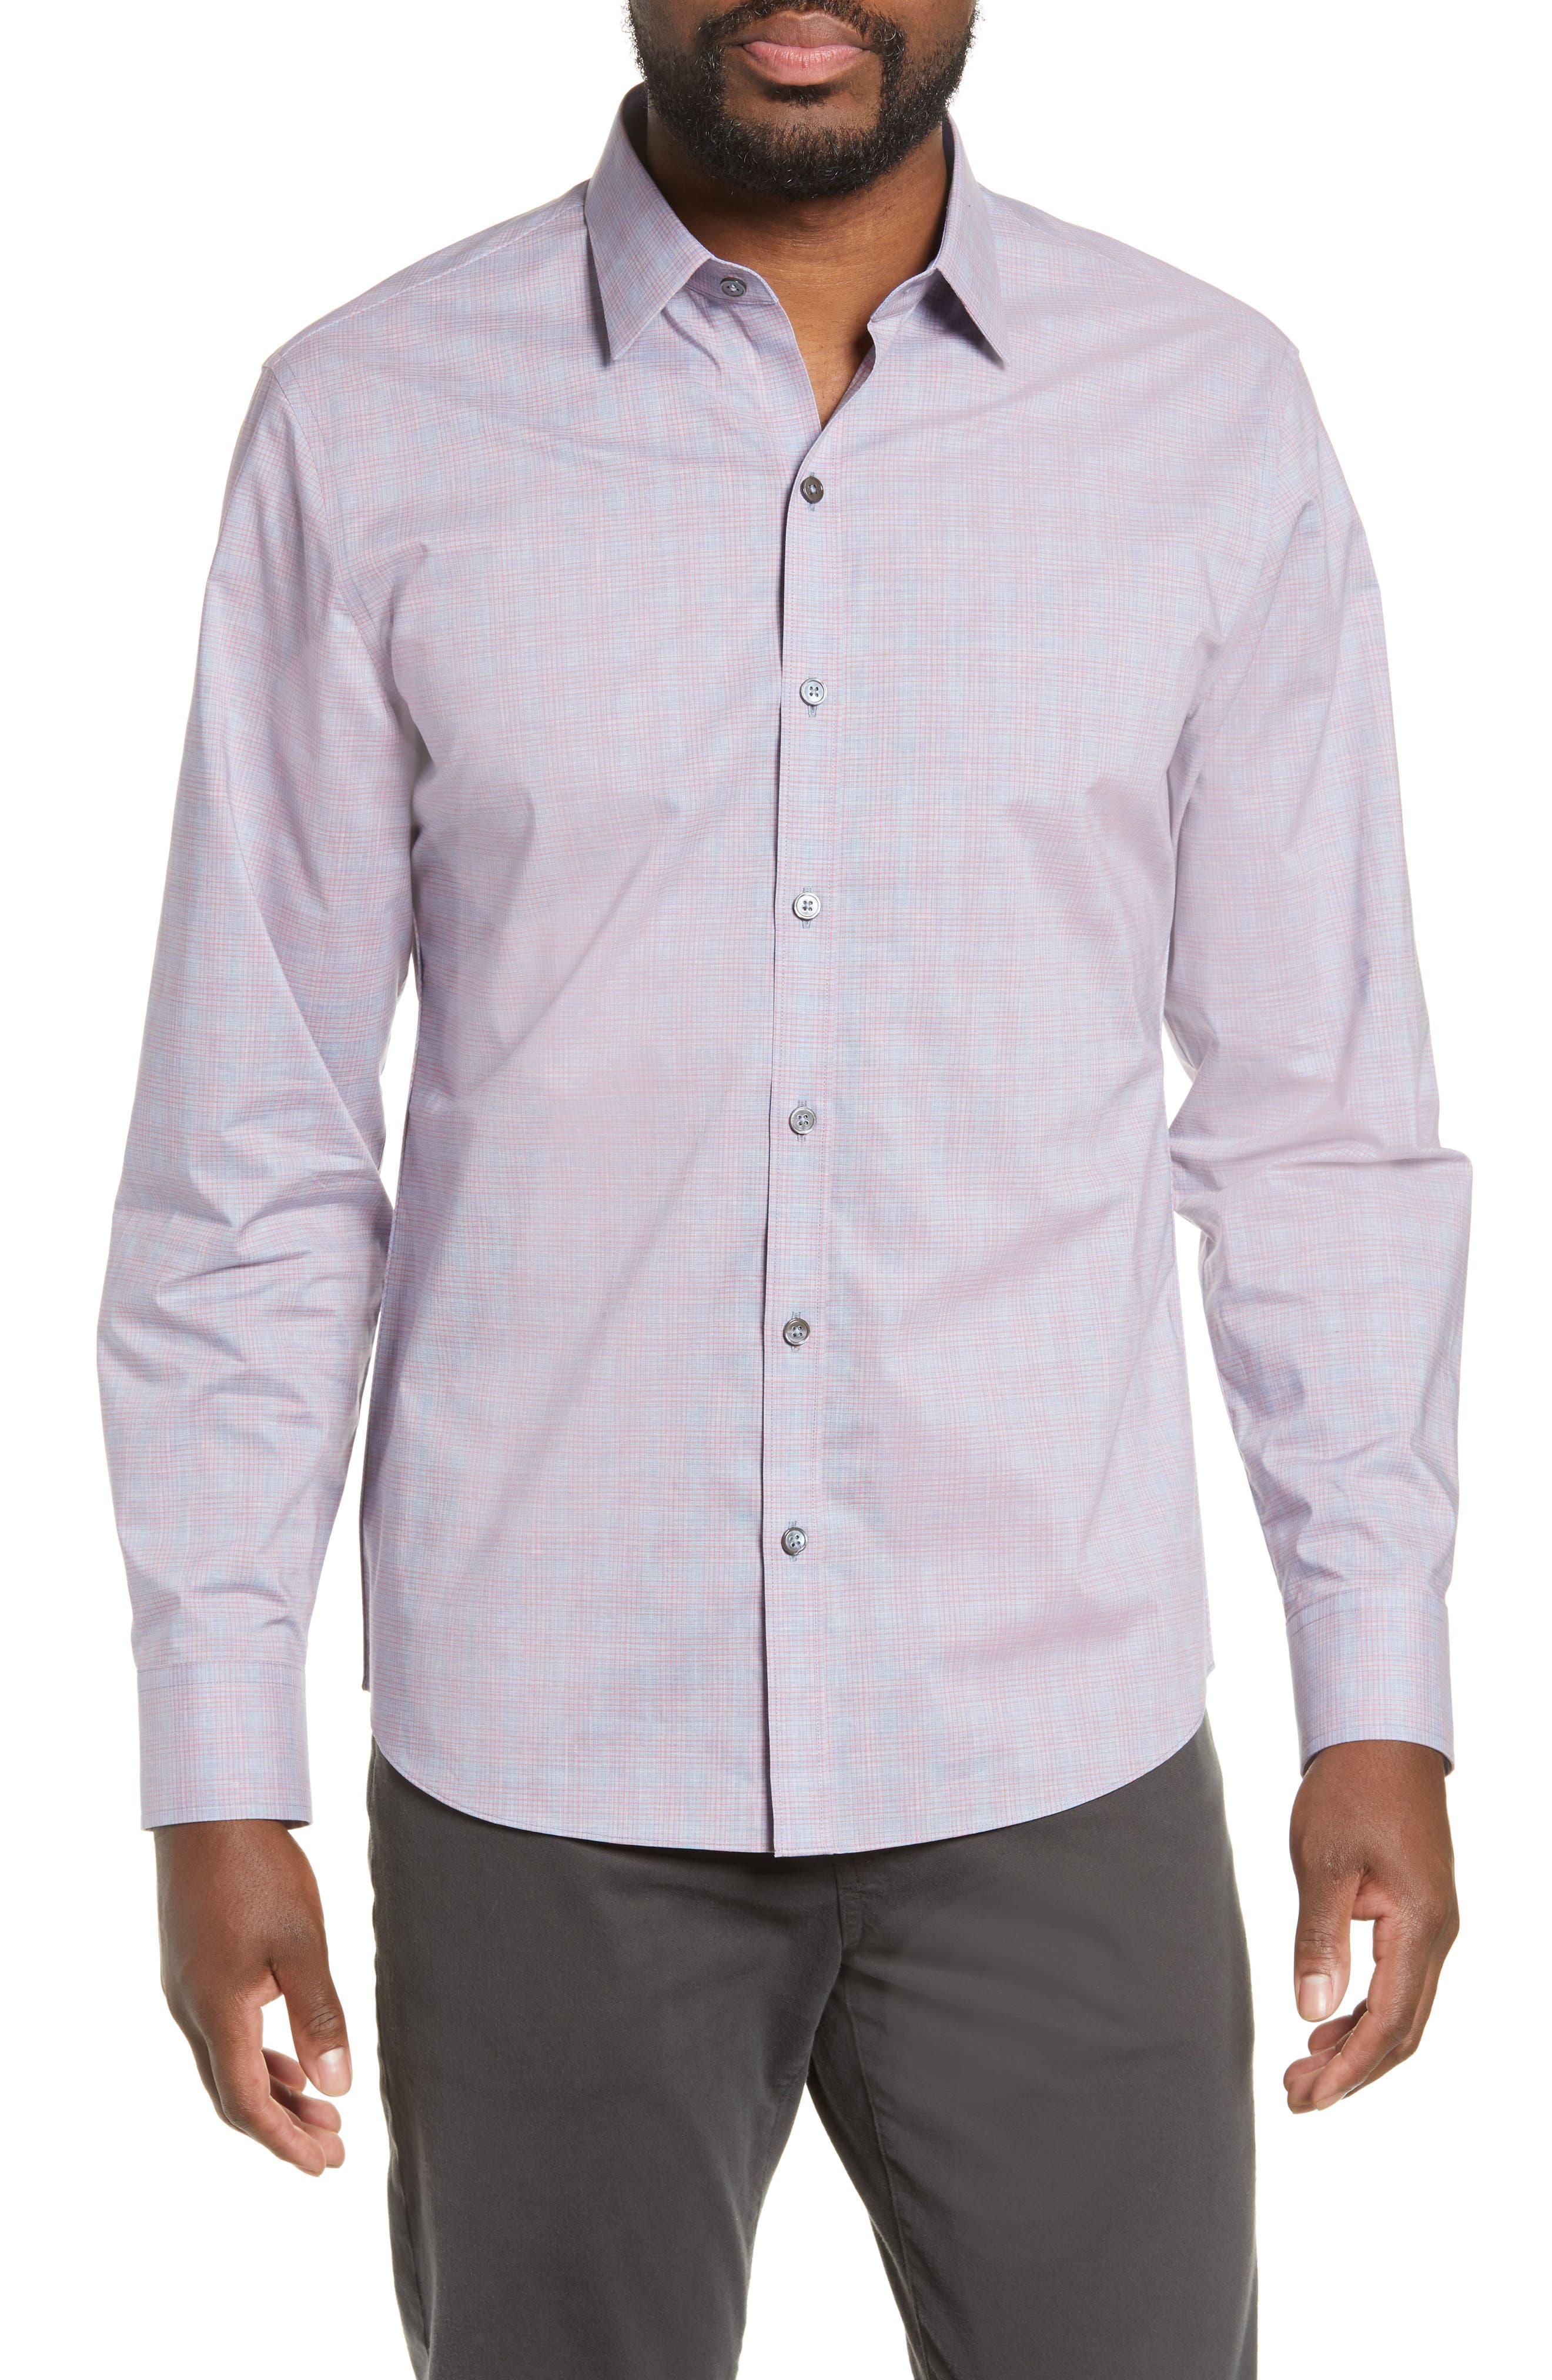 ZACHARY PRELL, Buckland Regular Fit Sport Shirt, Main thumbnail 1, color, FLAMINGO